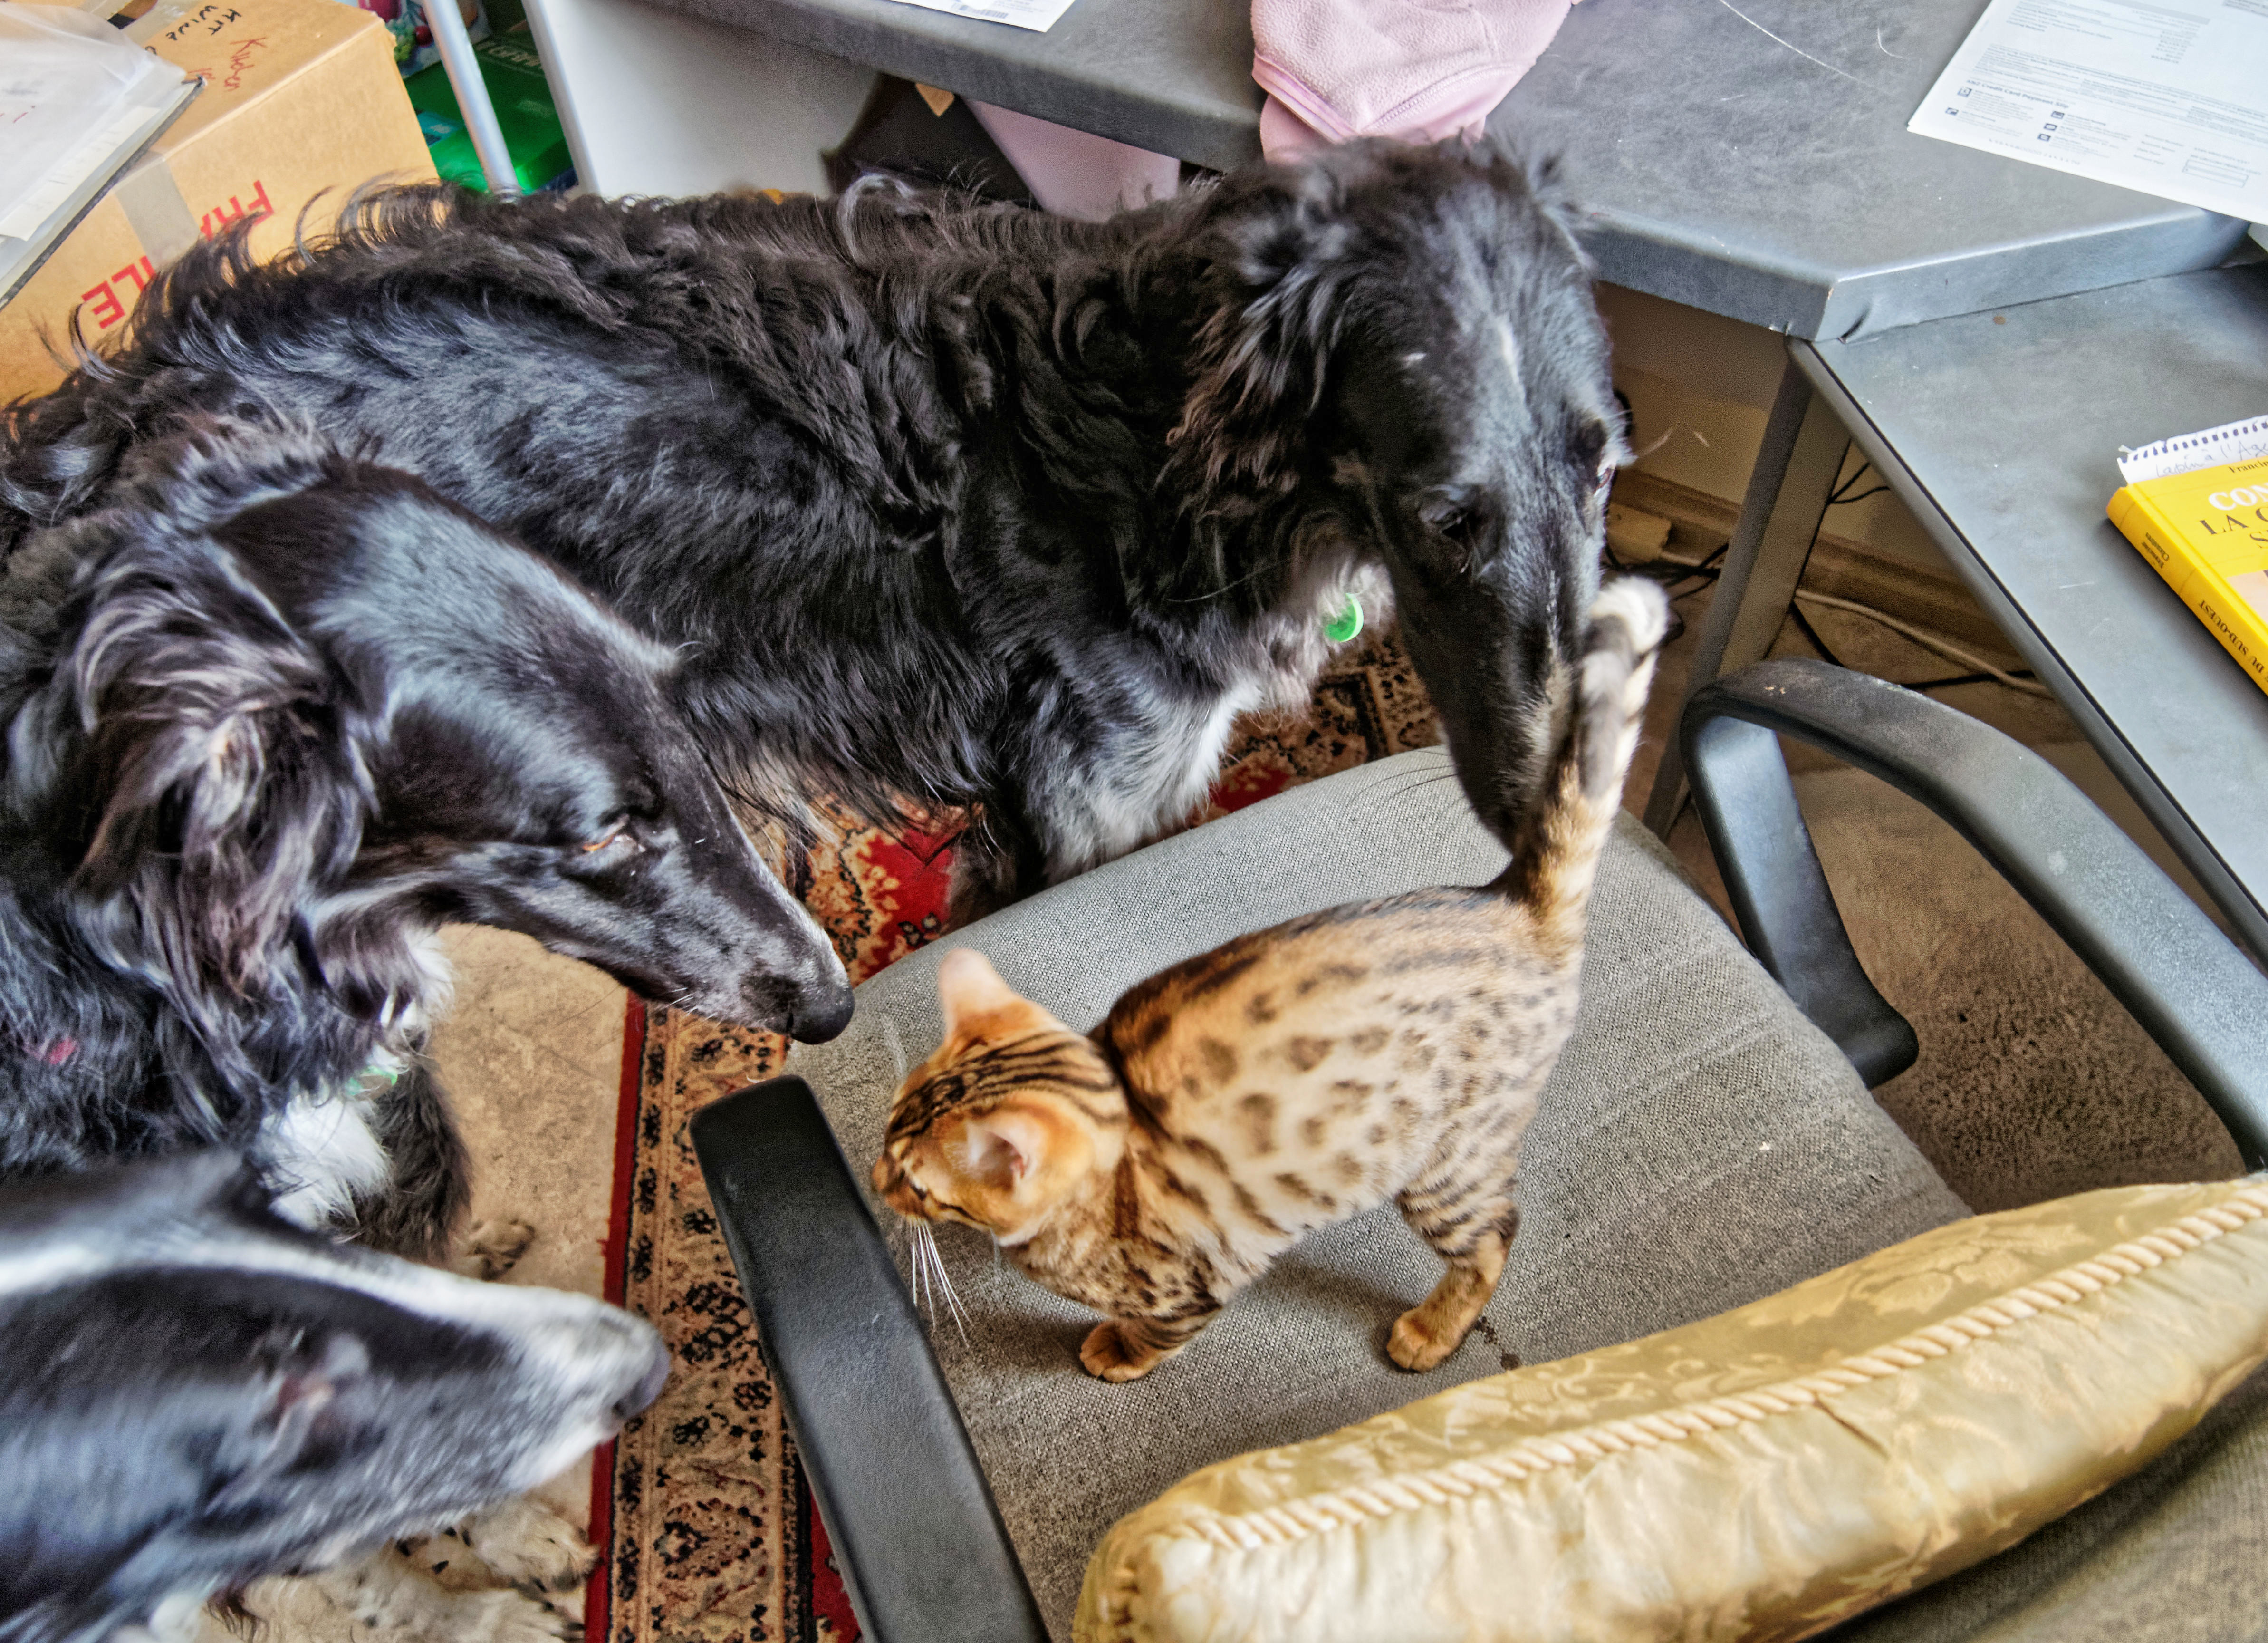 Dogs-and-Rani-2.jpeg